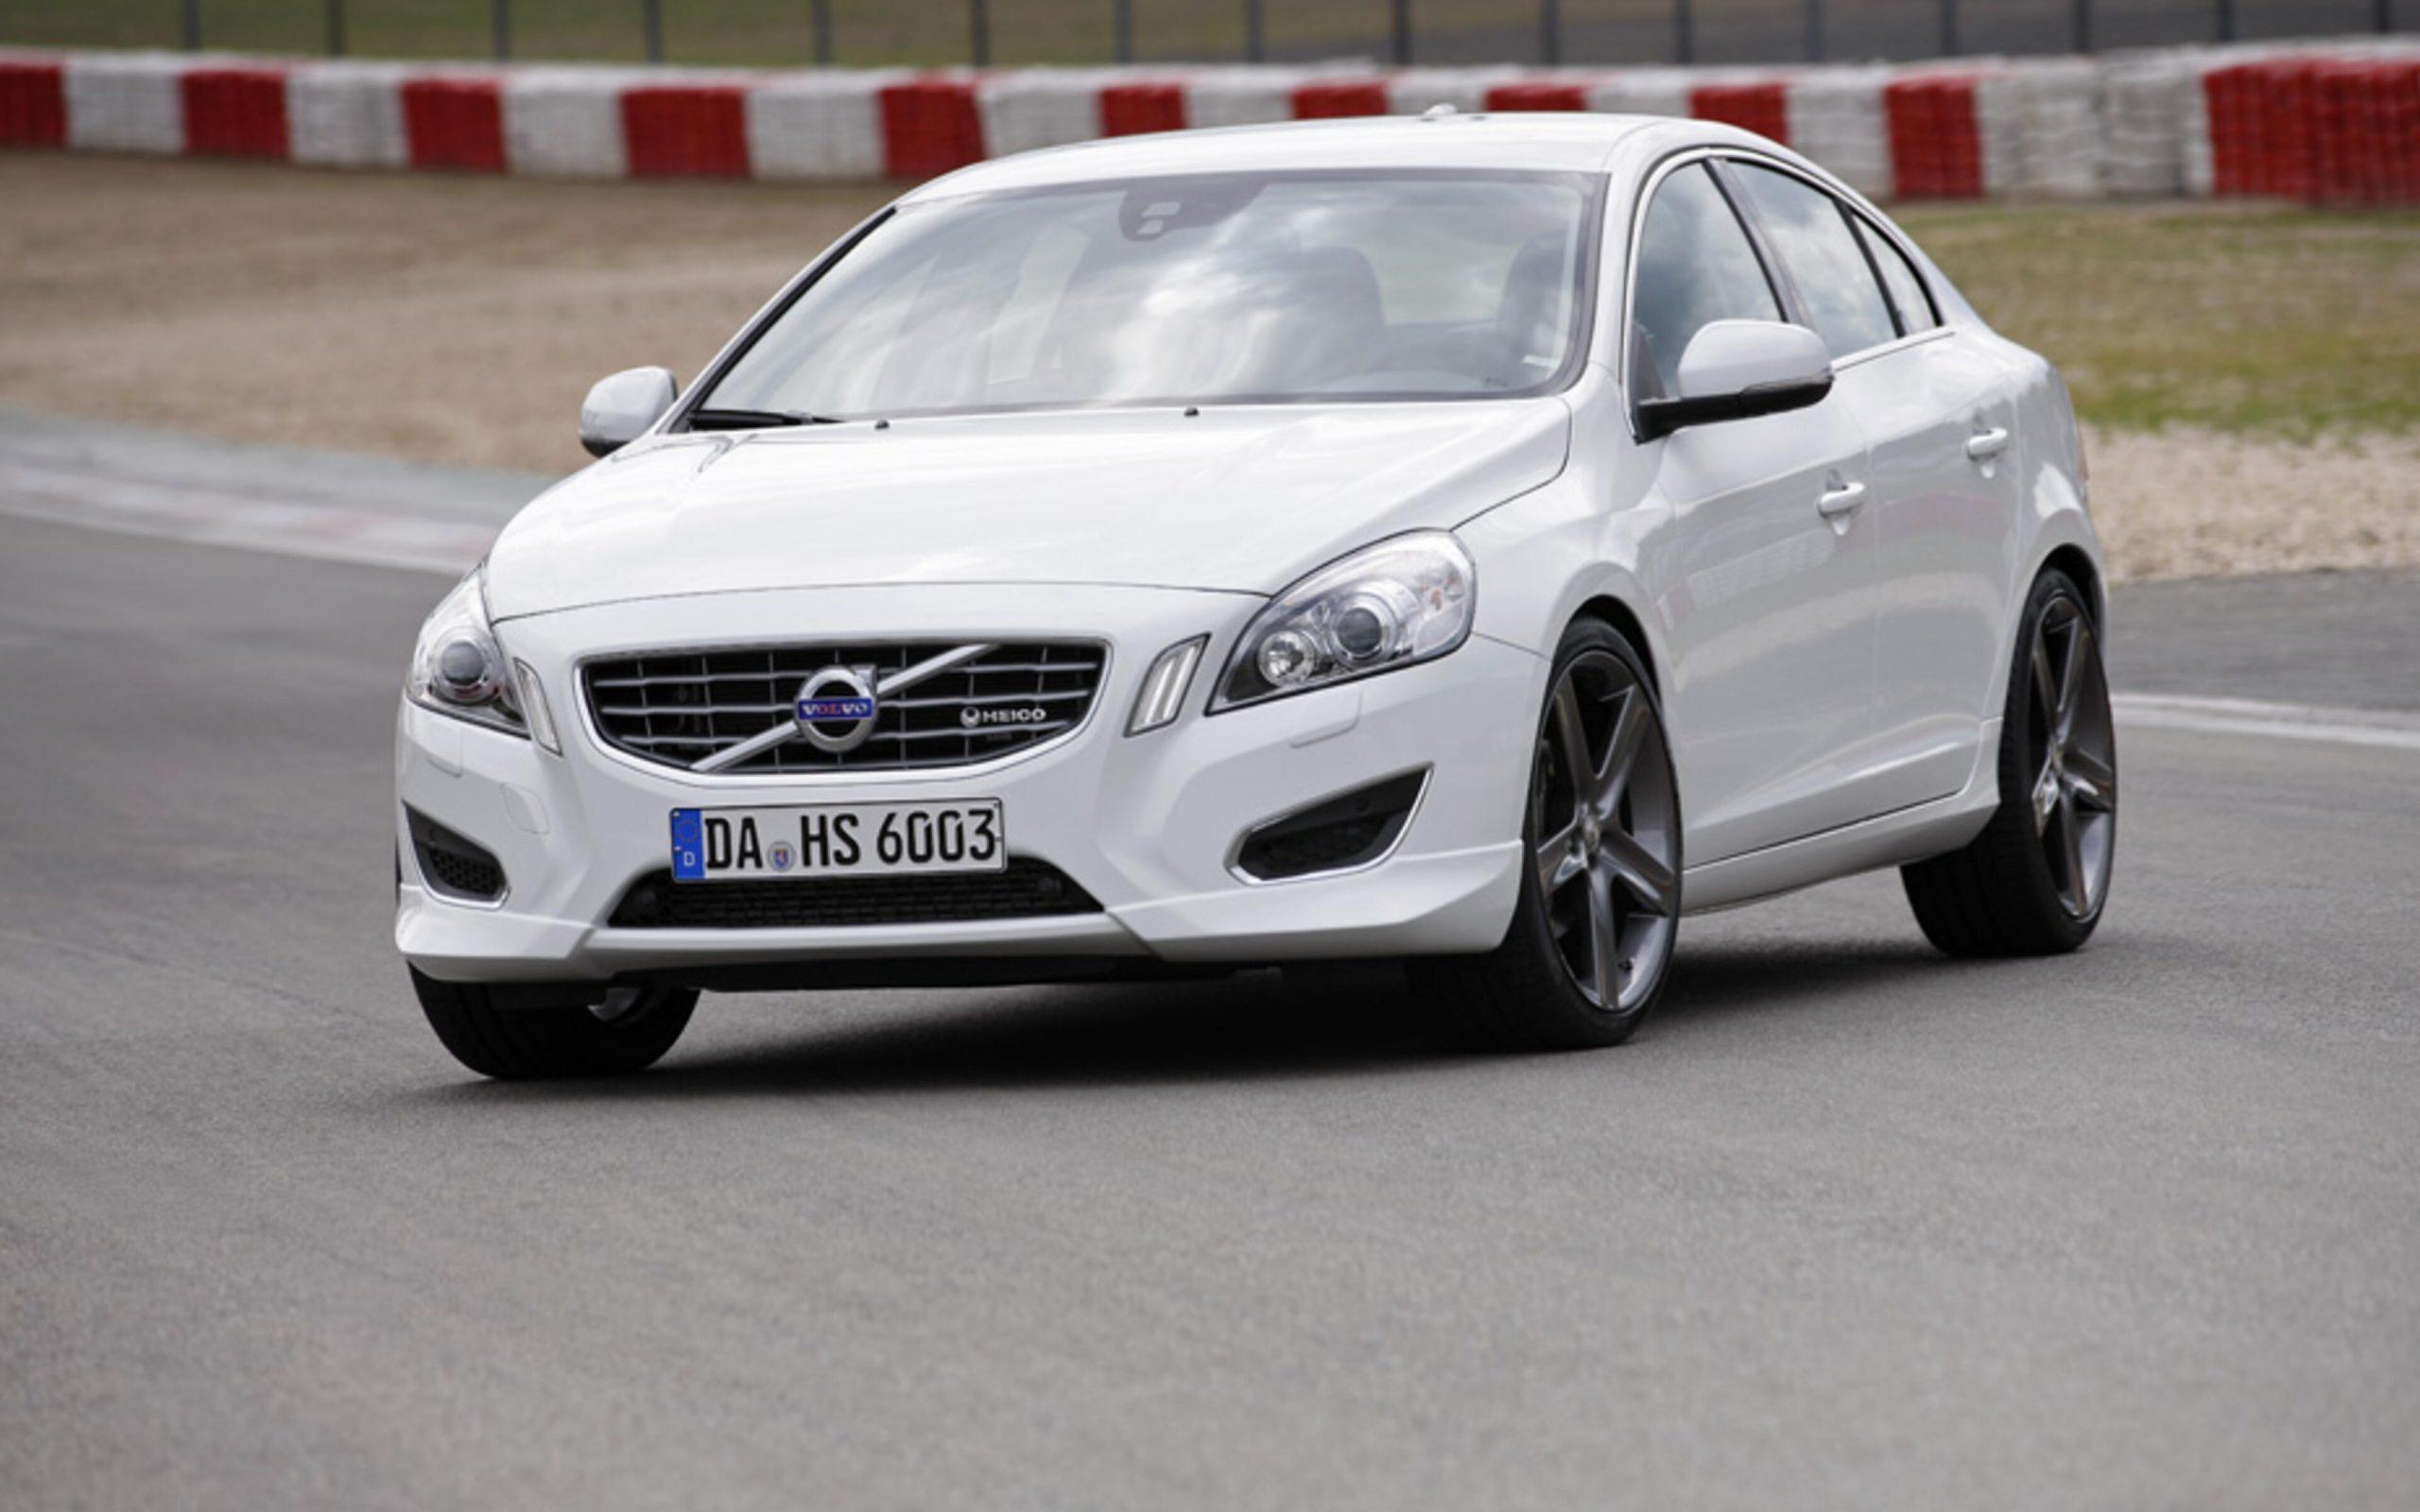 HEICO_SPORTIV_Volvo_S60_134_front_1_0